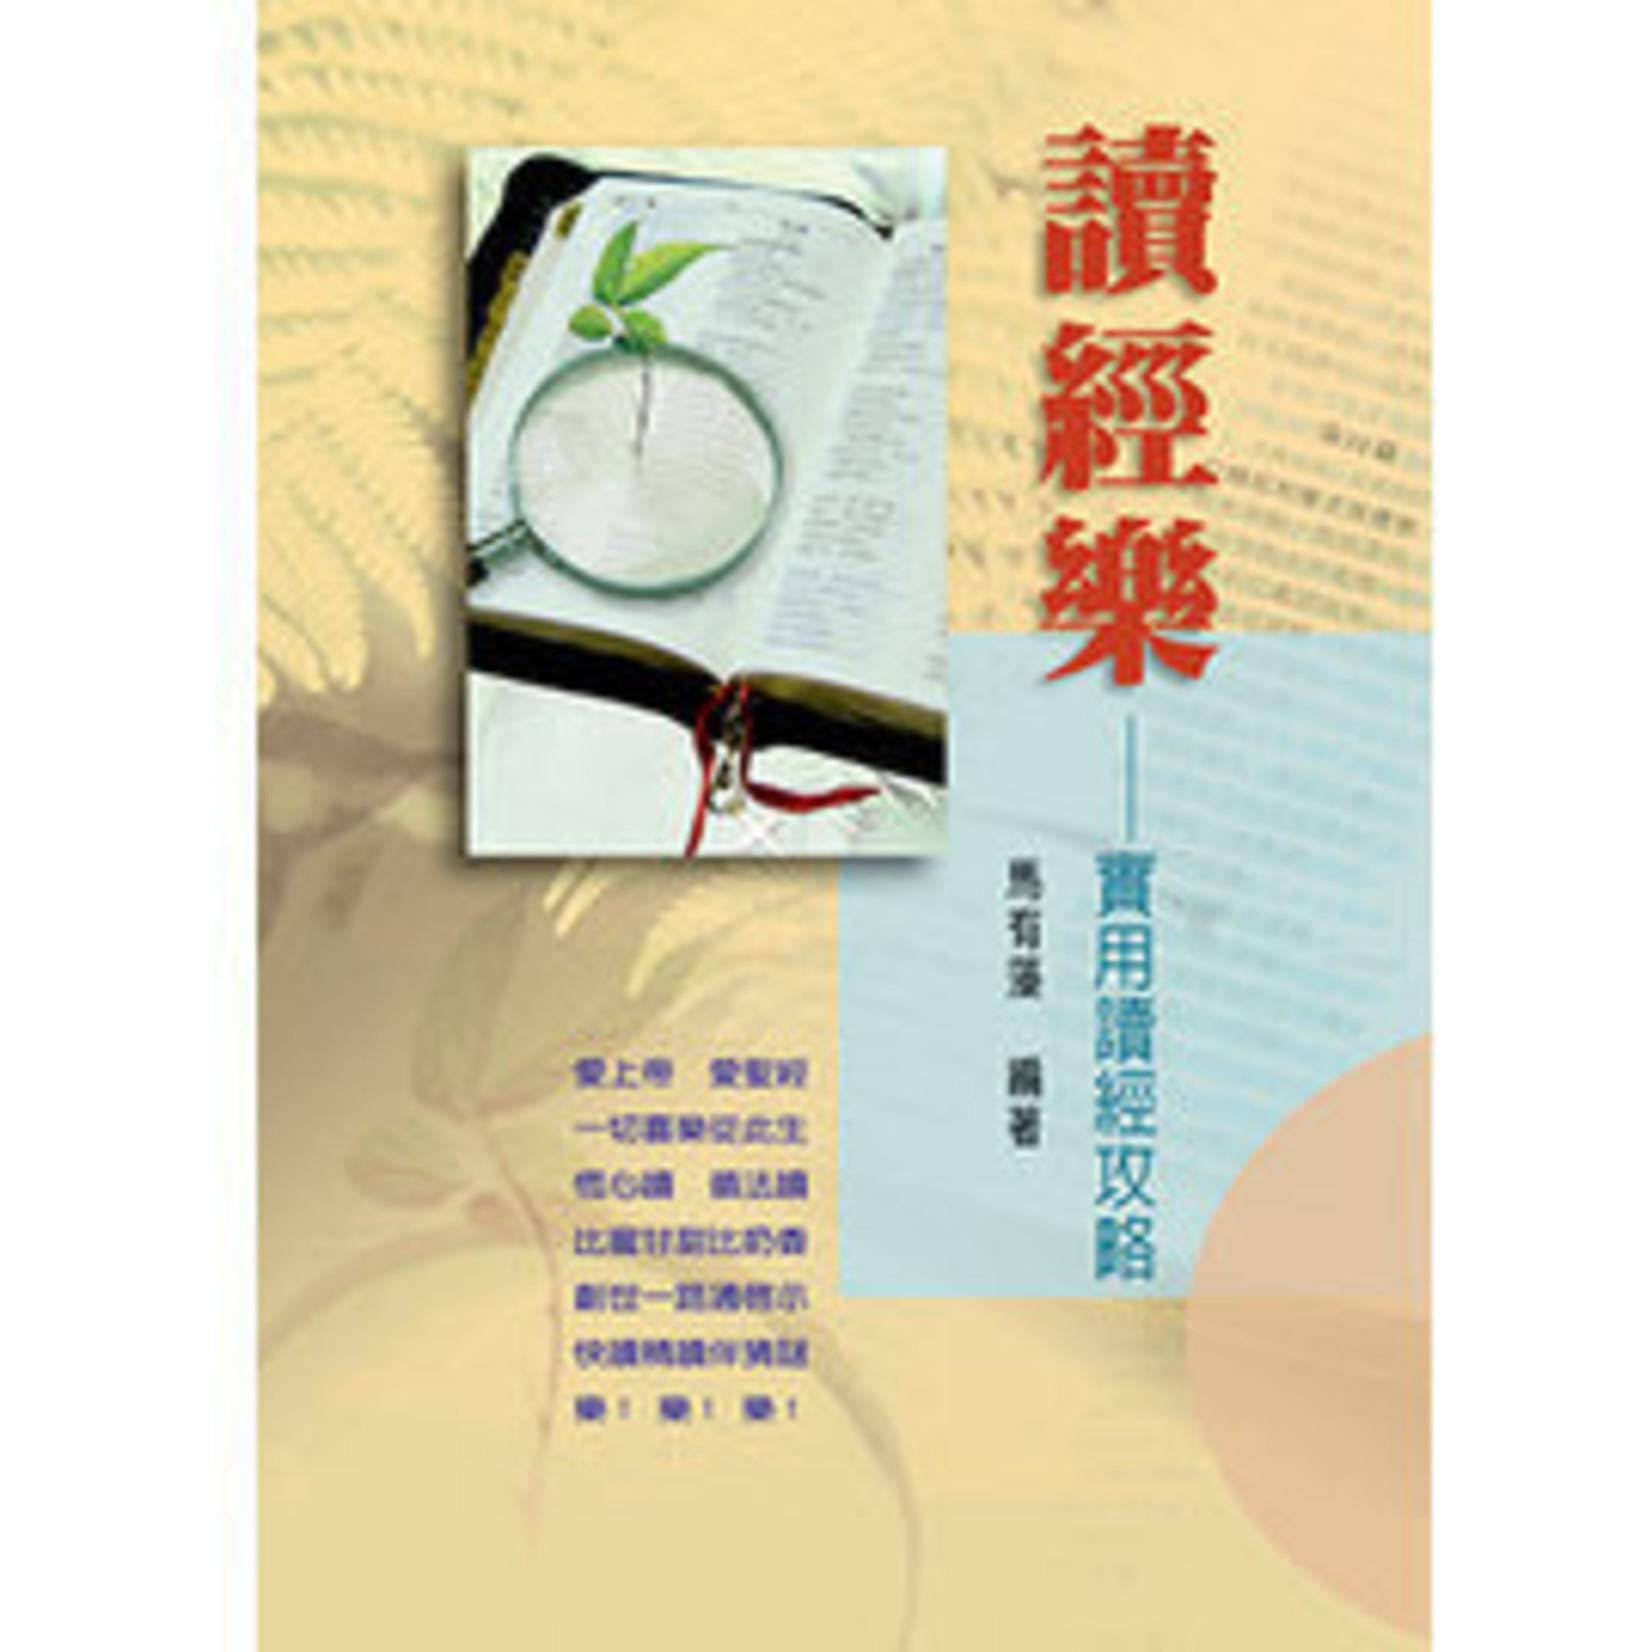 華人基督徒培訓供應中心 Chinese Christian Training Resources Center 讀經樂:實用讀經攻略